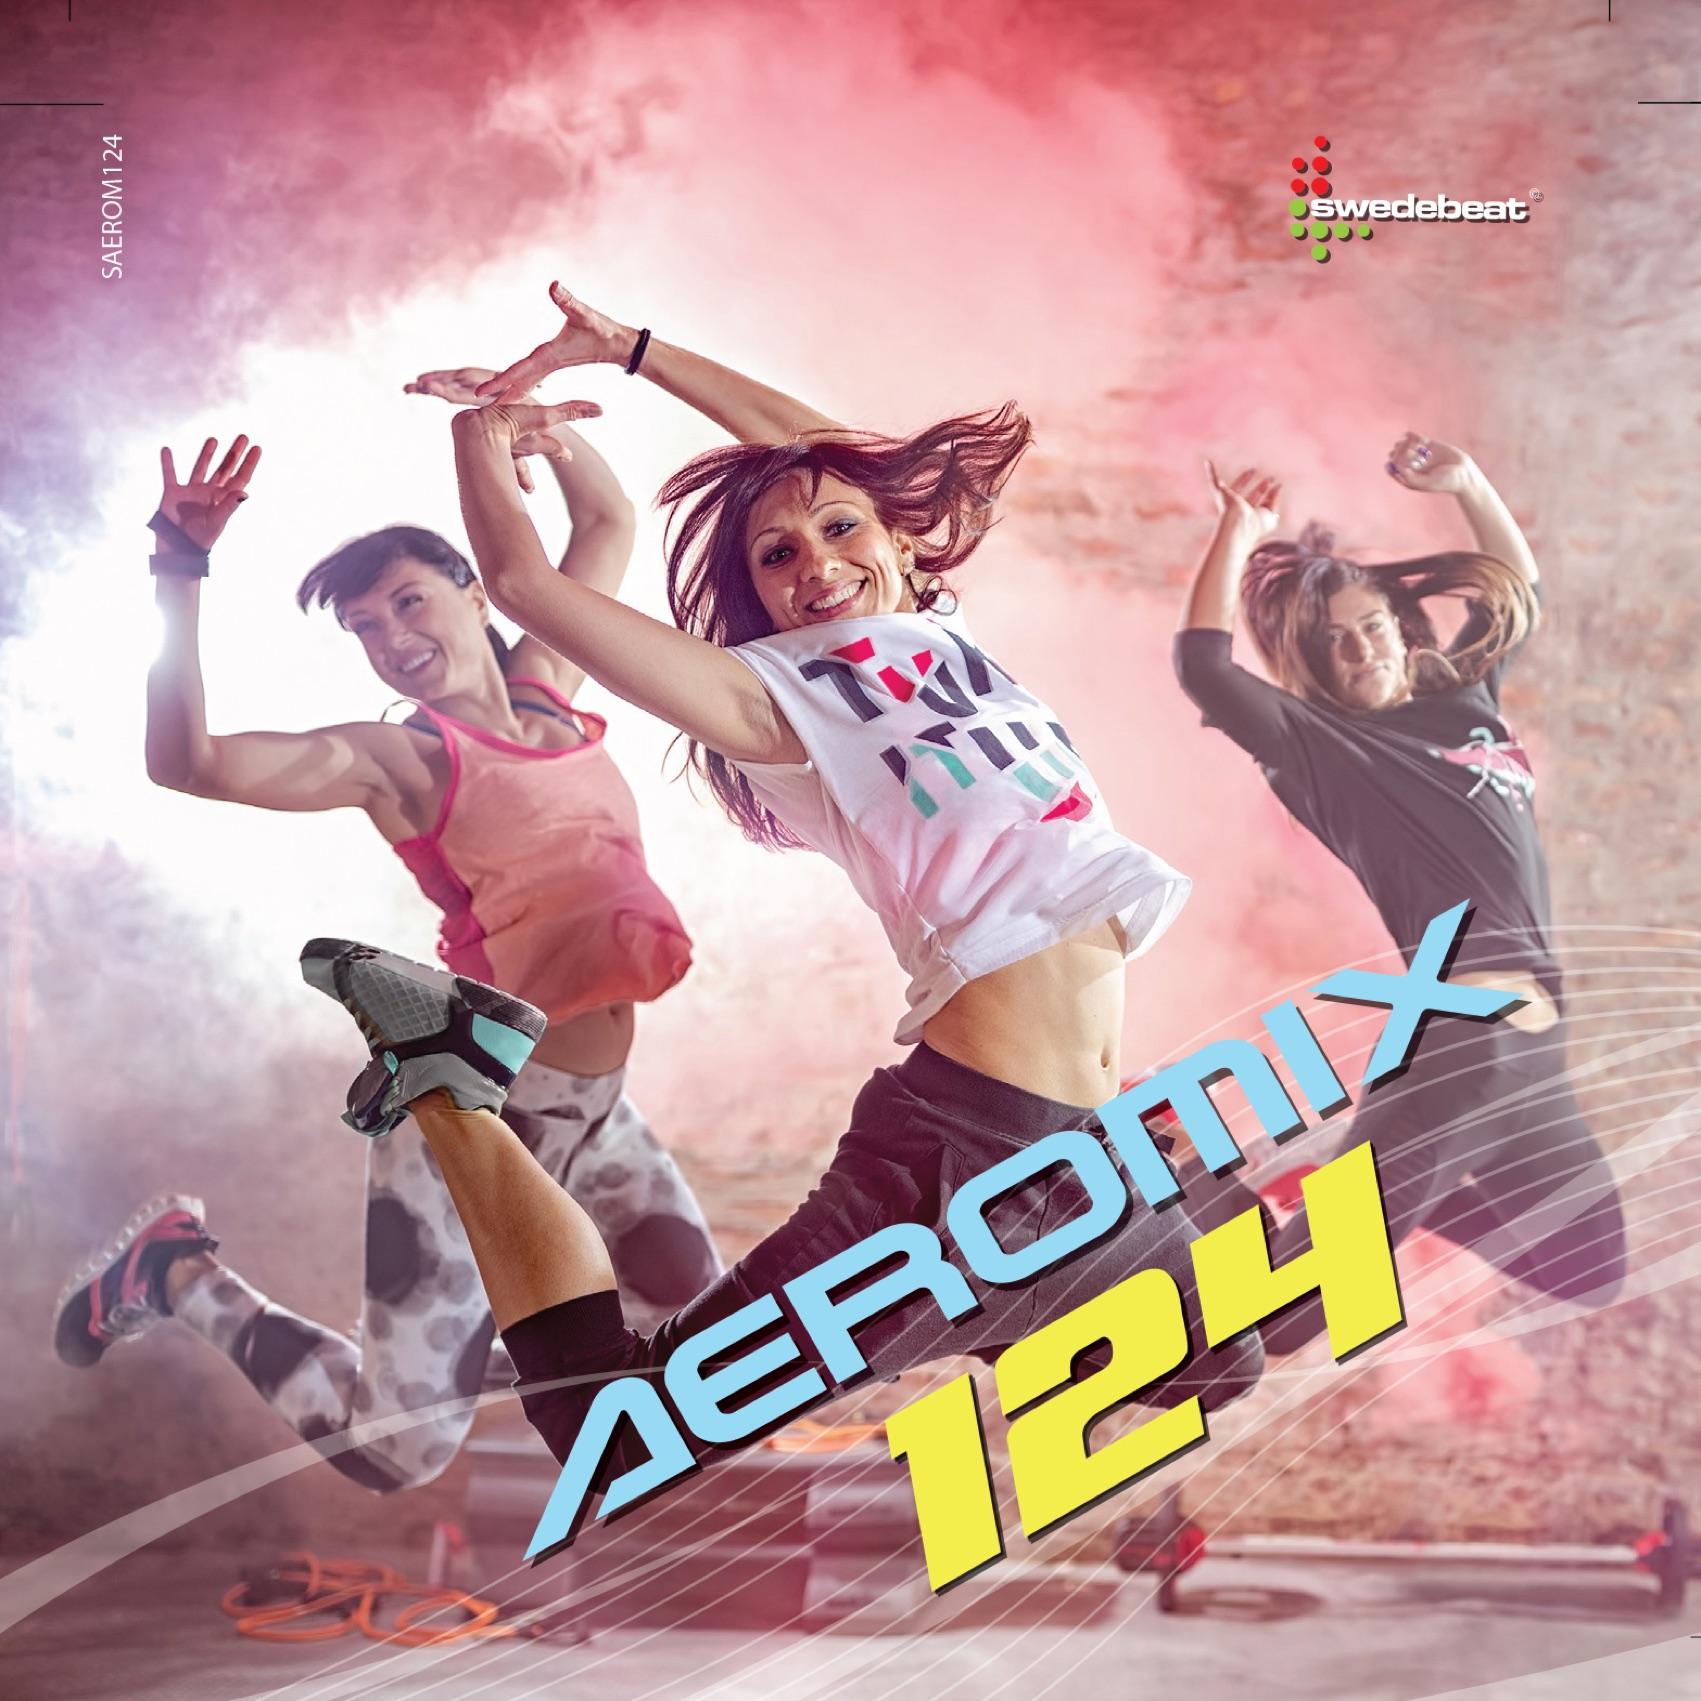 Aeromix 124 - MTrax Fitness Music